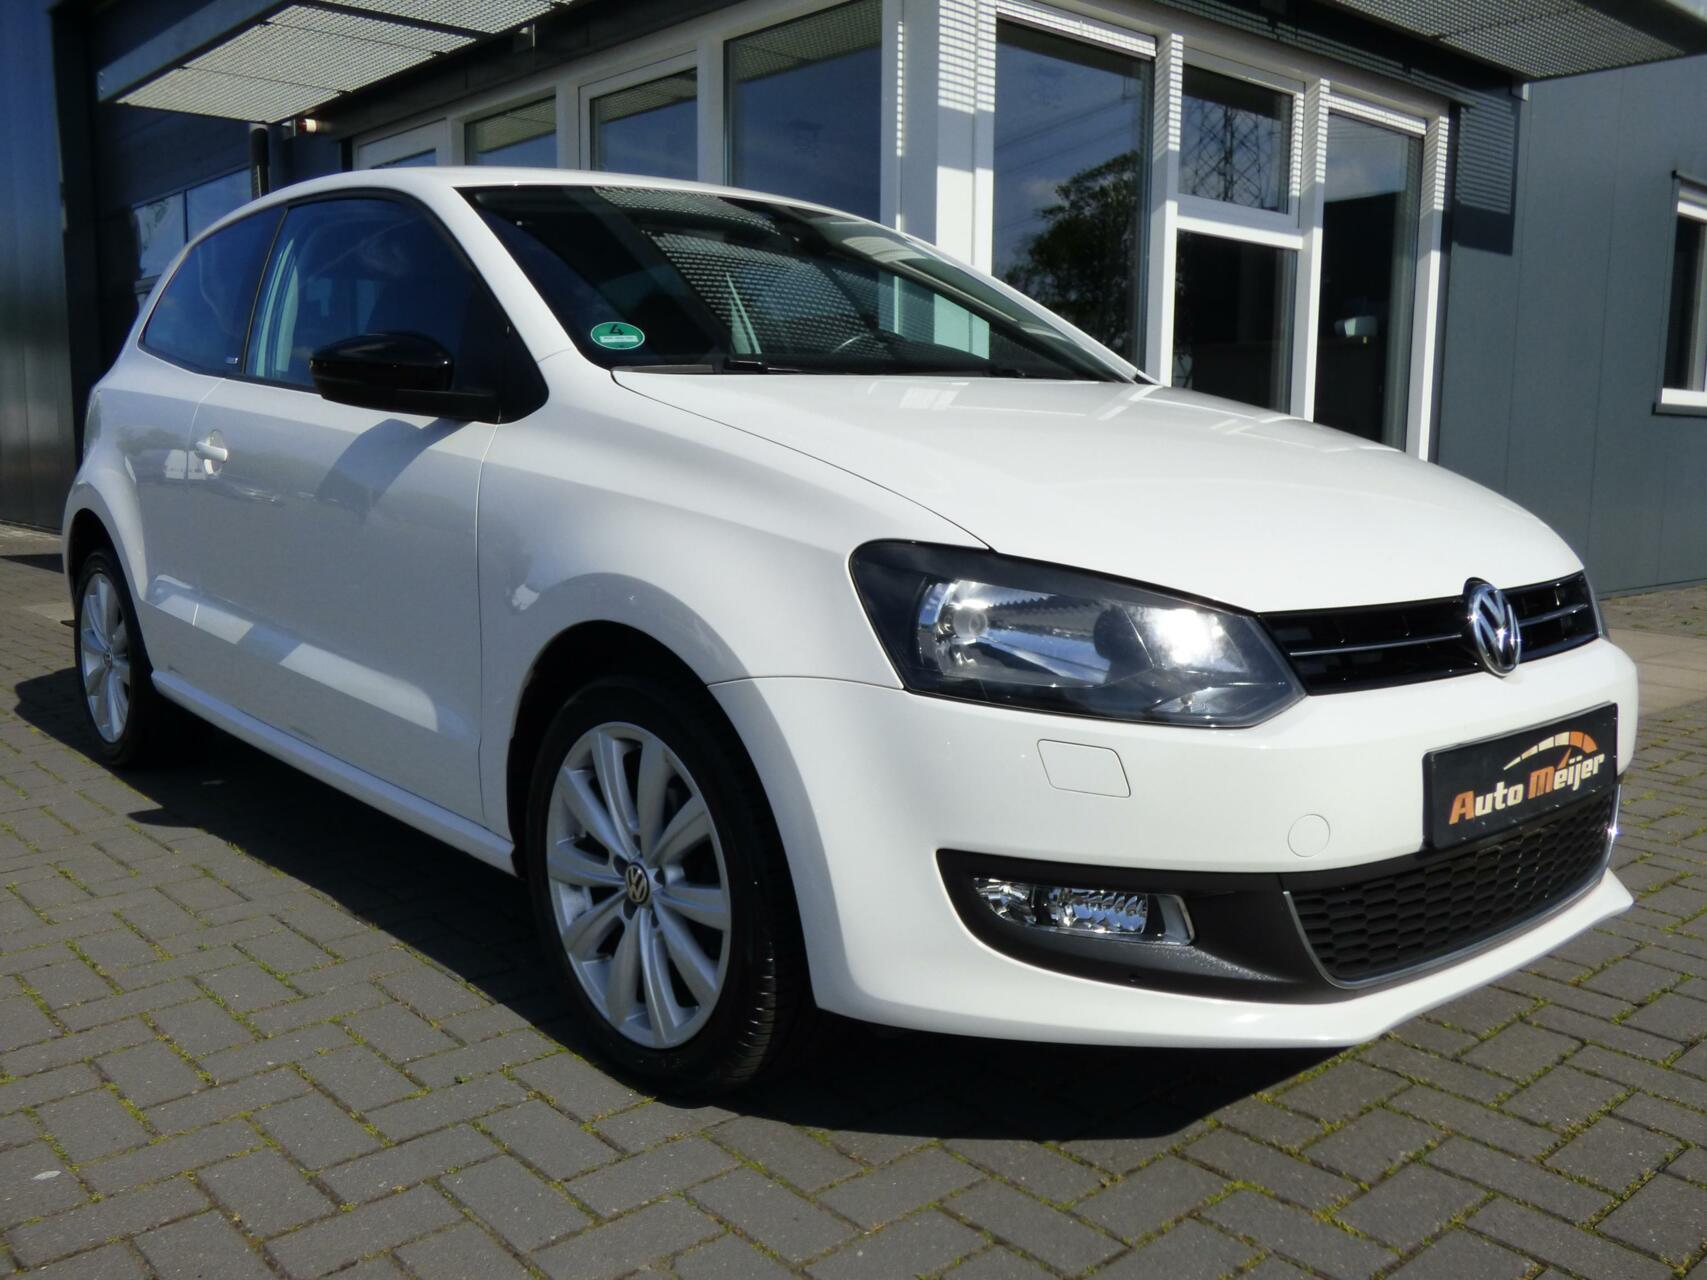 Volkswagen Polo 1.2 Style   AIRCO   131000 KM!!!